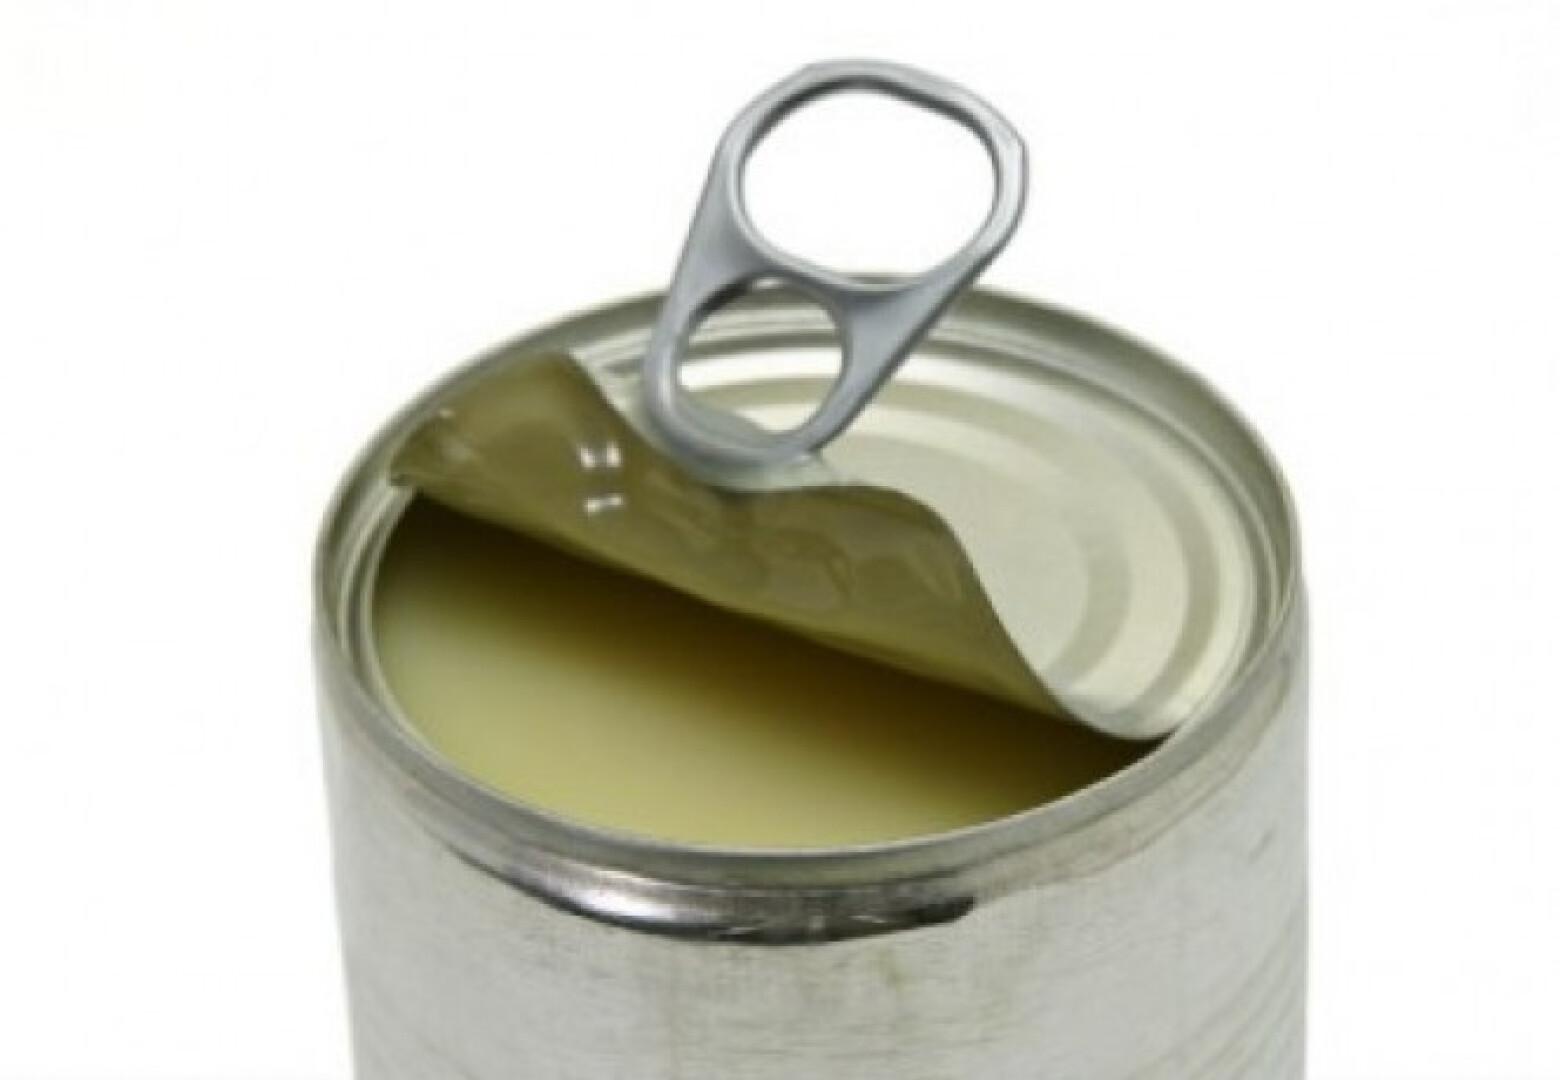 Sűrített tej